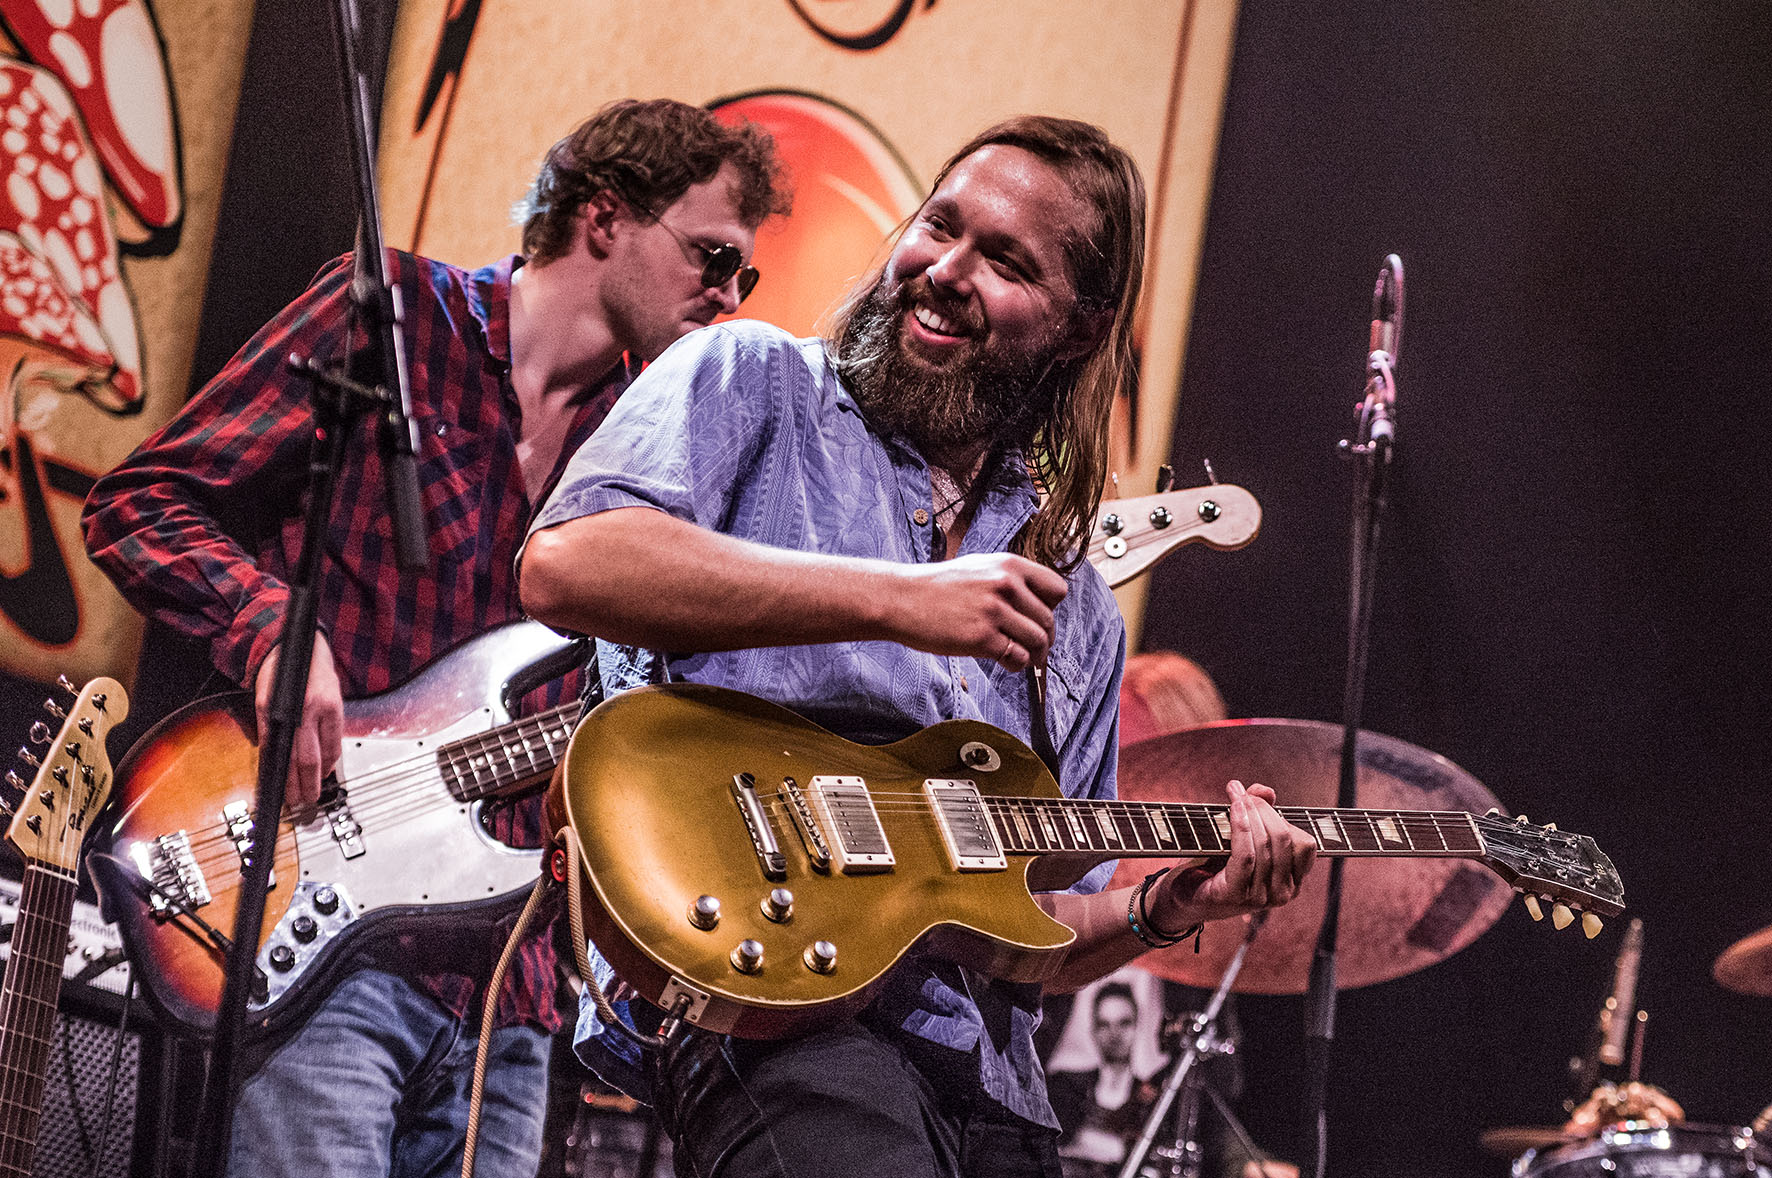 Leif de Leeuw Band am 4. May 2020 @ Rockhouse Salzburg.